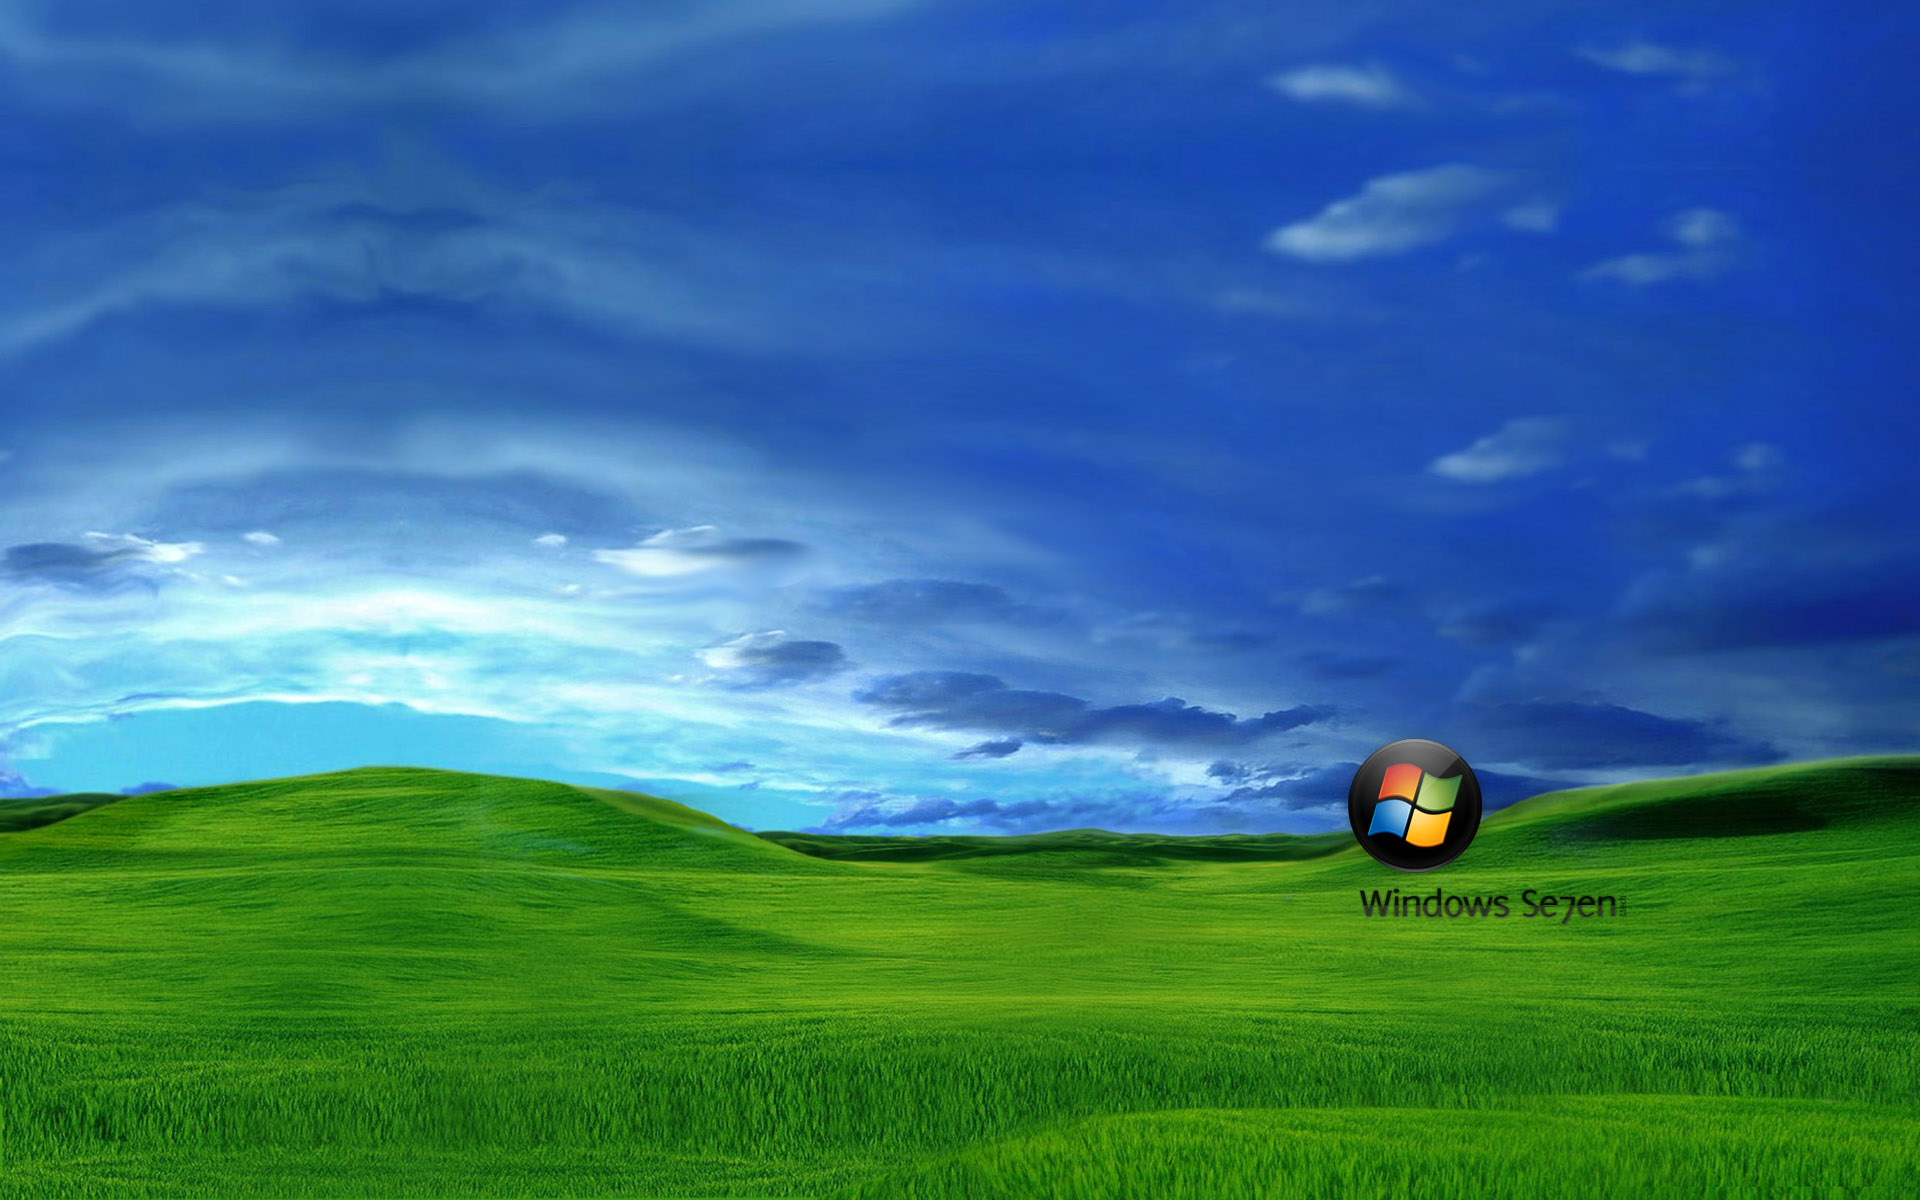 Windows 7 Wallpaper Hd wallpaper   488121 1920x1200